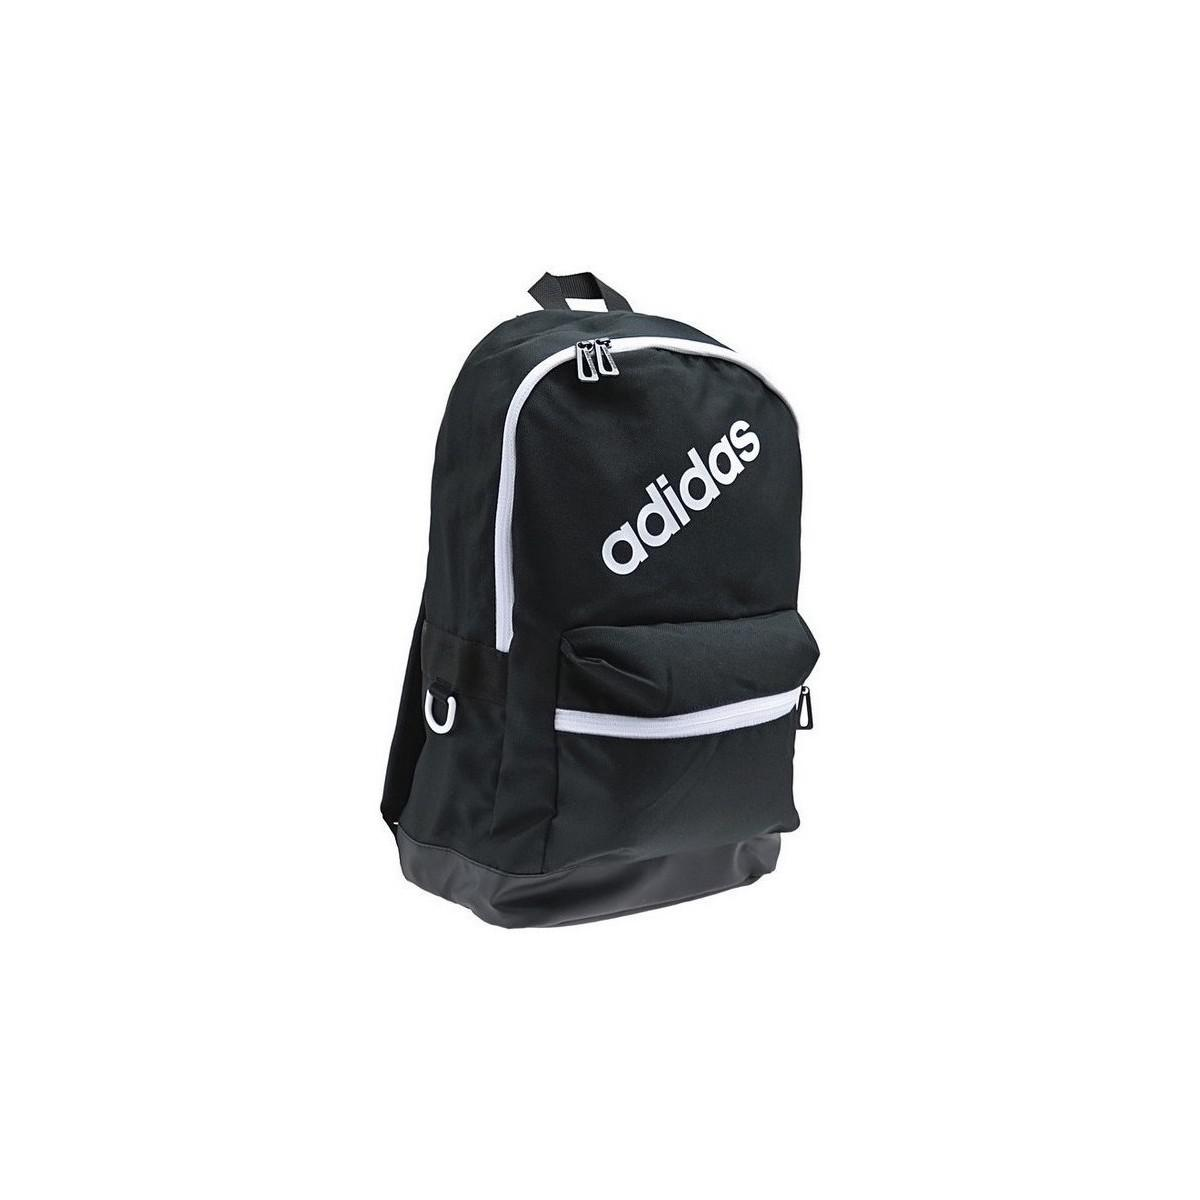 d4dcae2e368 adidas Bp Daily Men's Backpack In Black in Black for Men - Lyst